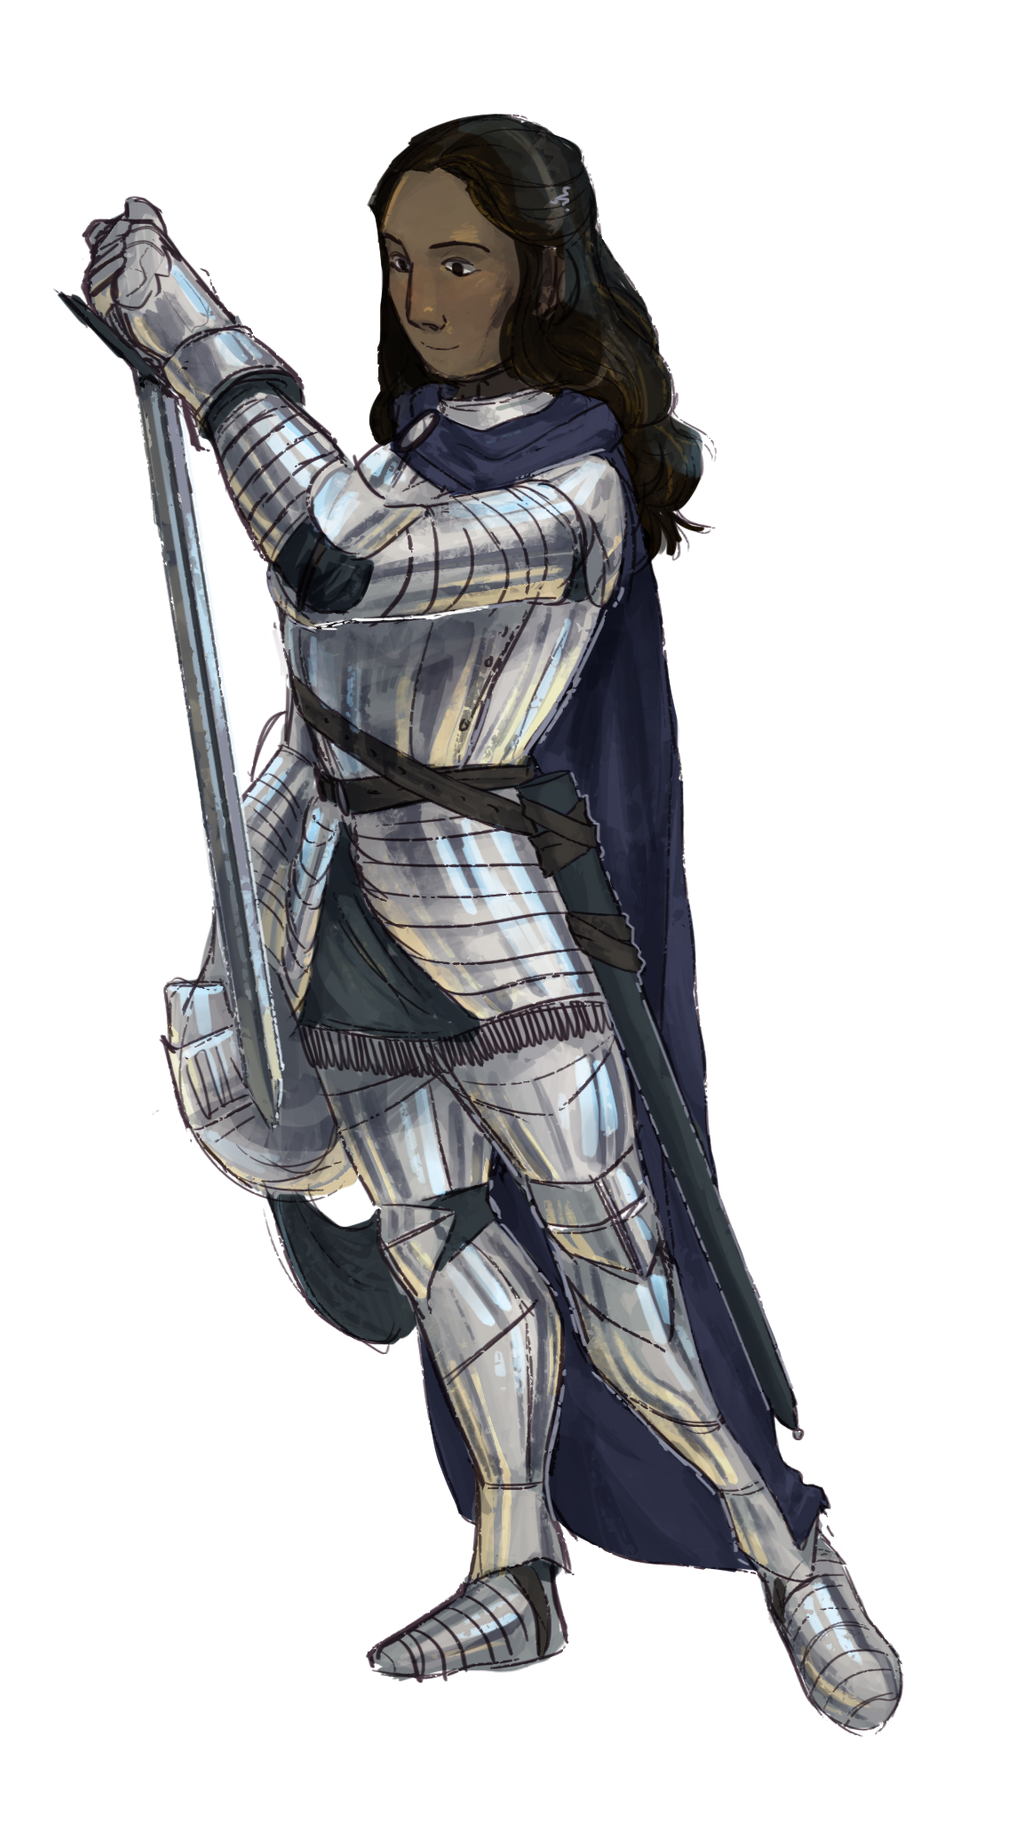 Knight In Shining Armor By Thewisestdino On Deviantart